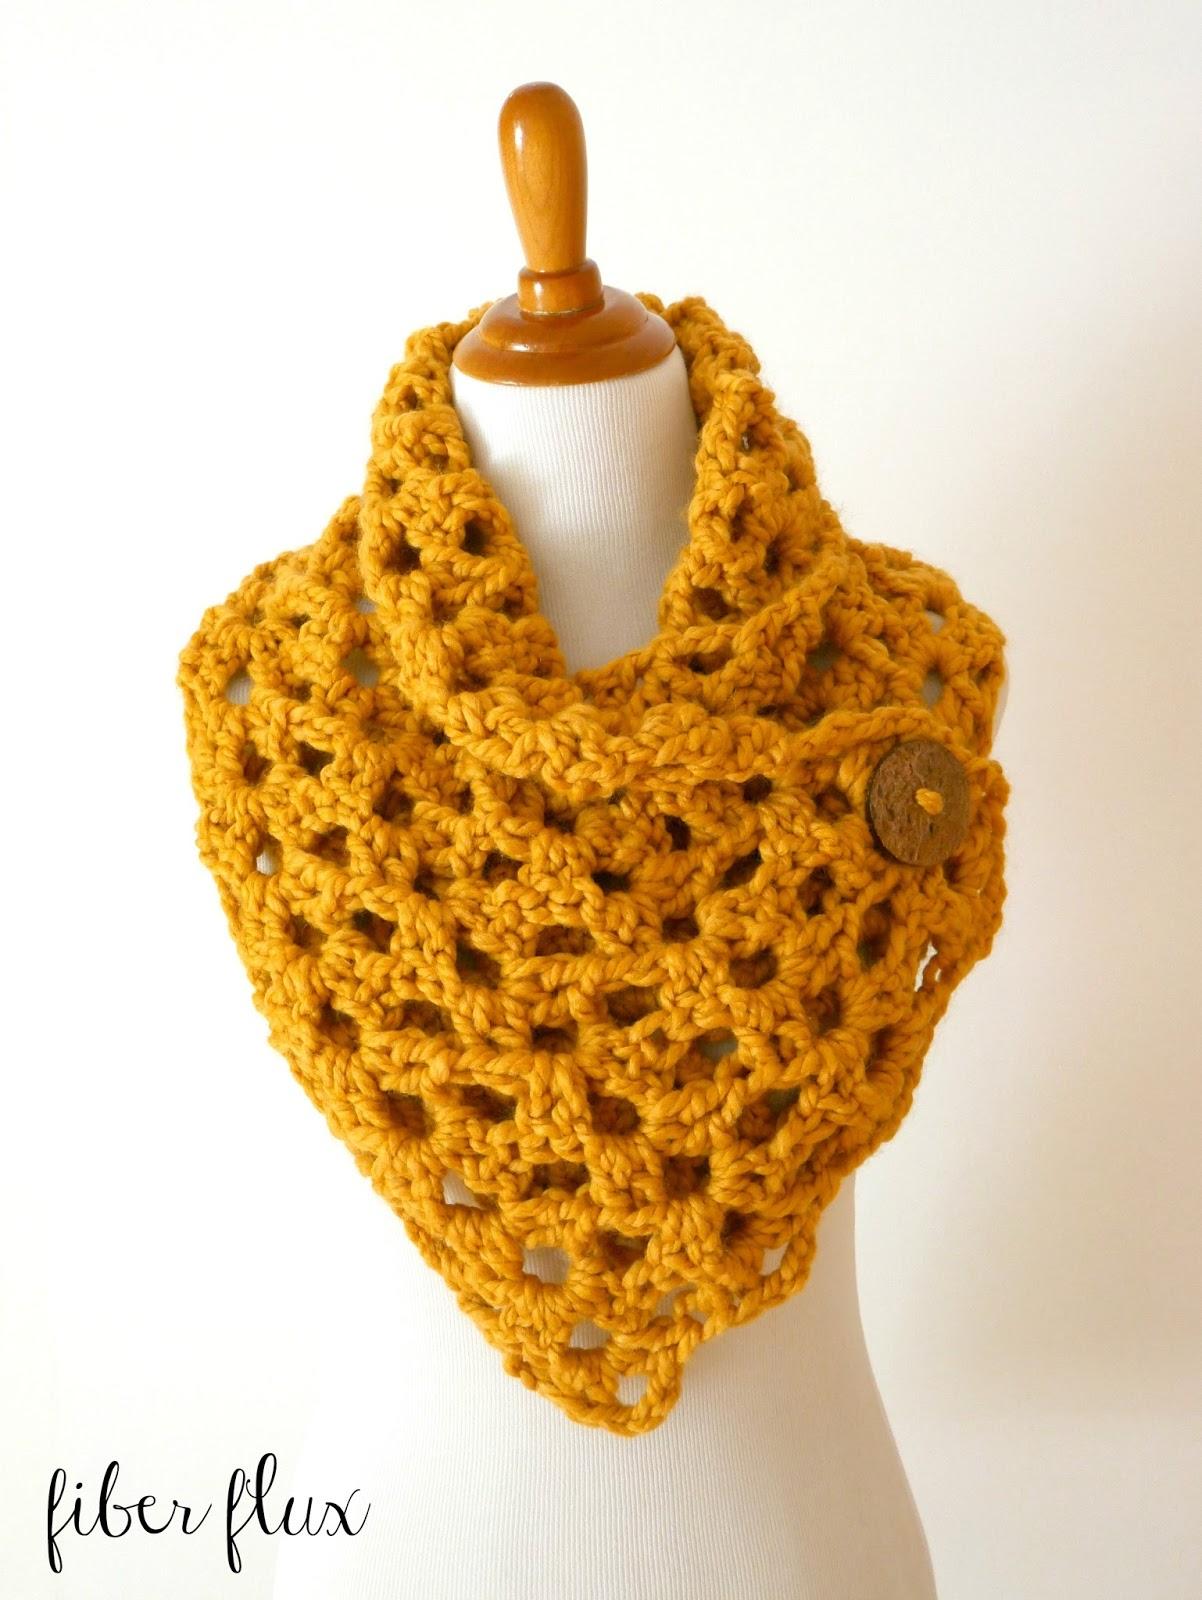 Free Crochet Patterns Button Cowl : Fiber Flux: Free Crochet Pattern...Autumn Morning Button Cowl!